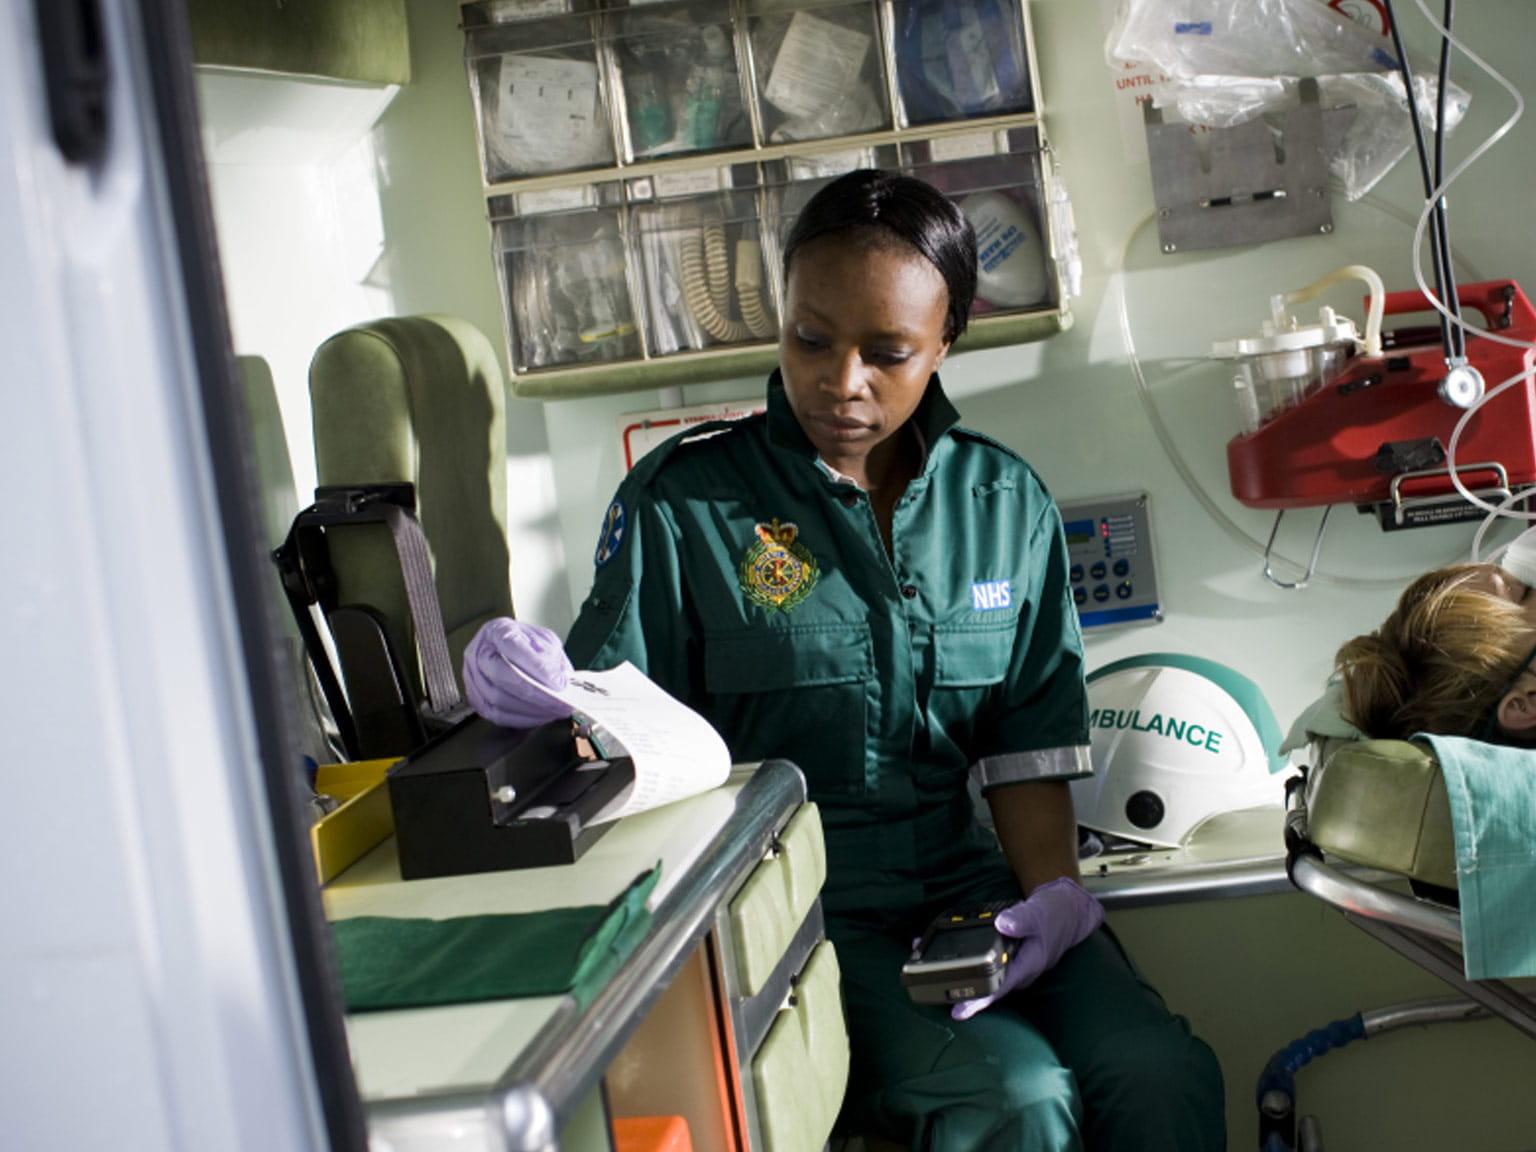 Pj printing document in ambulance